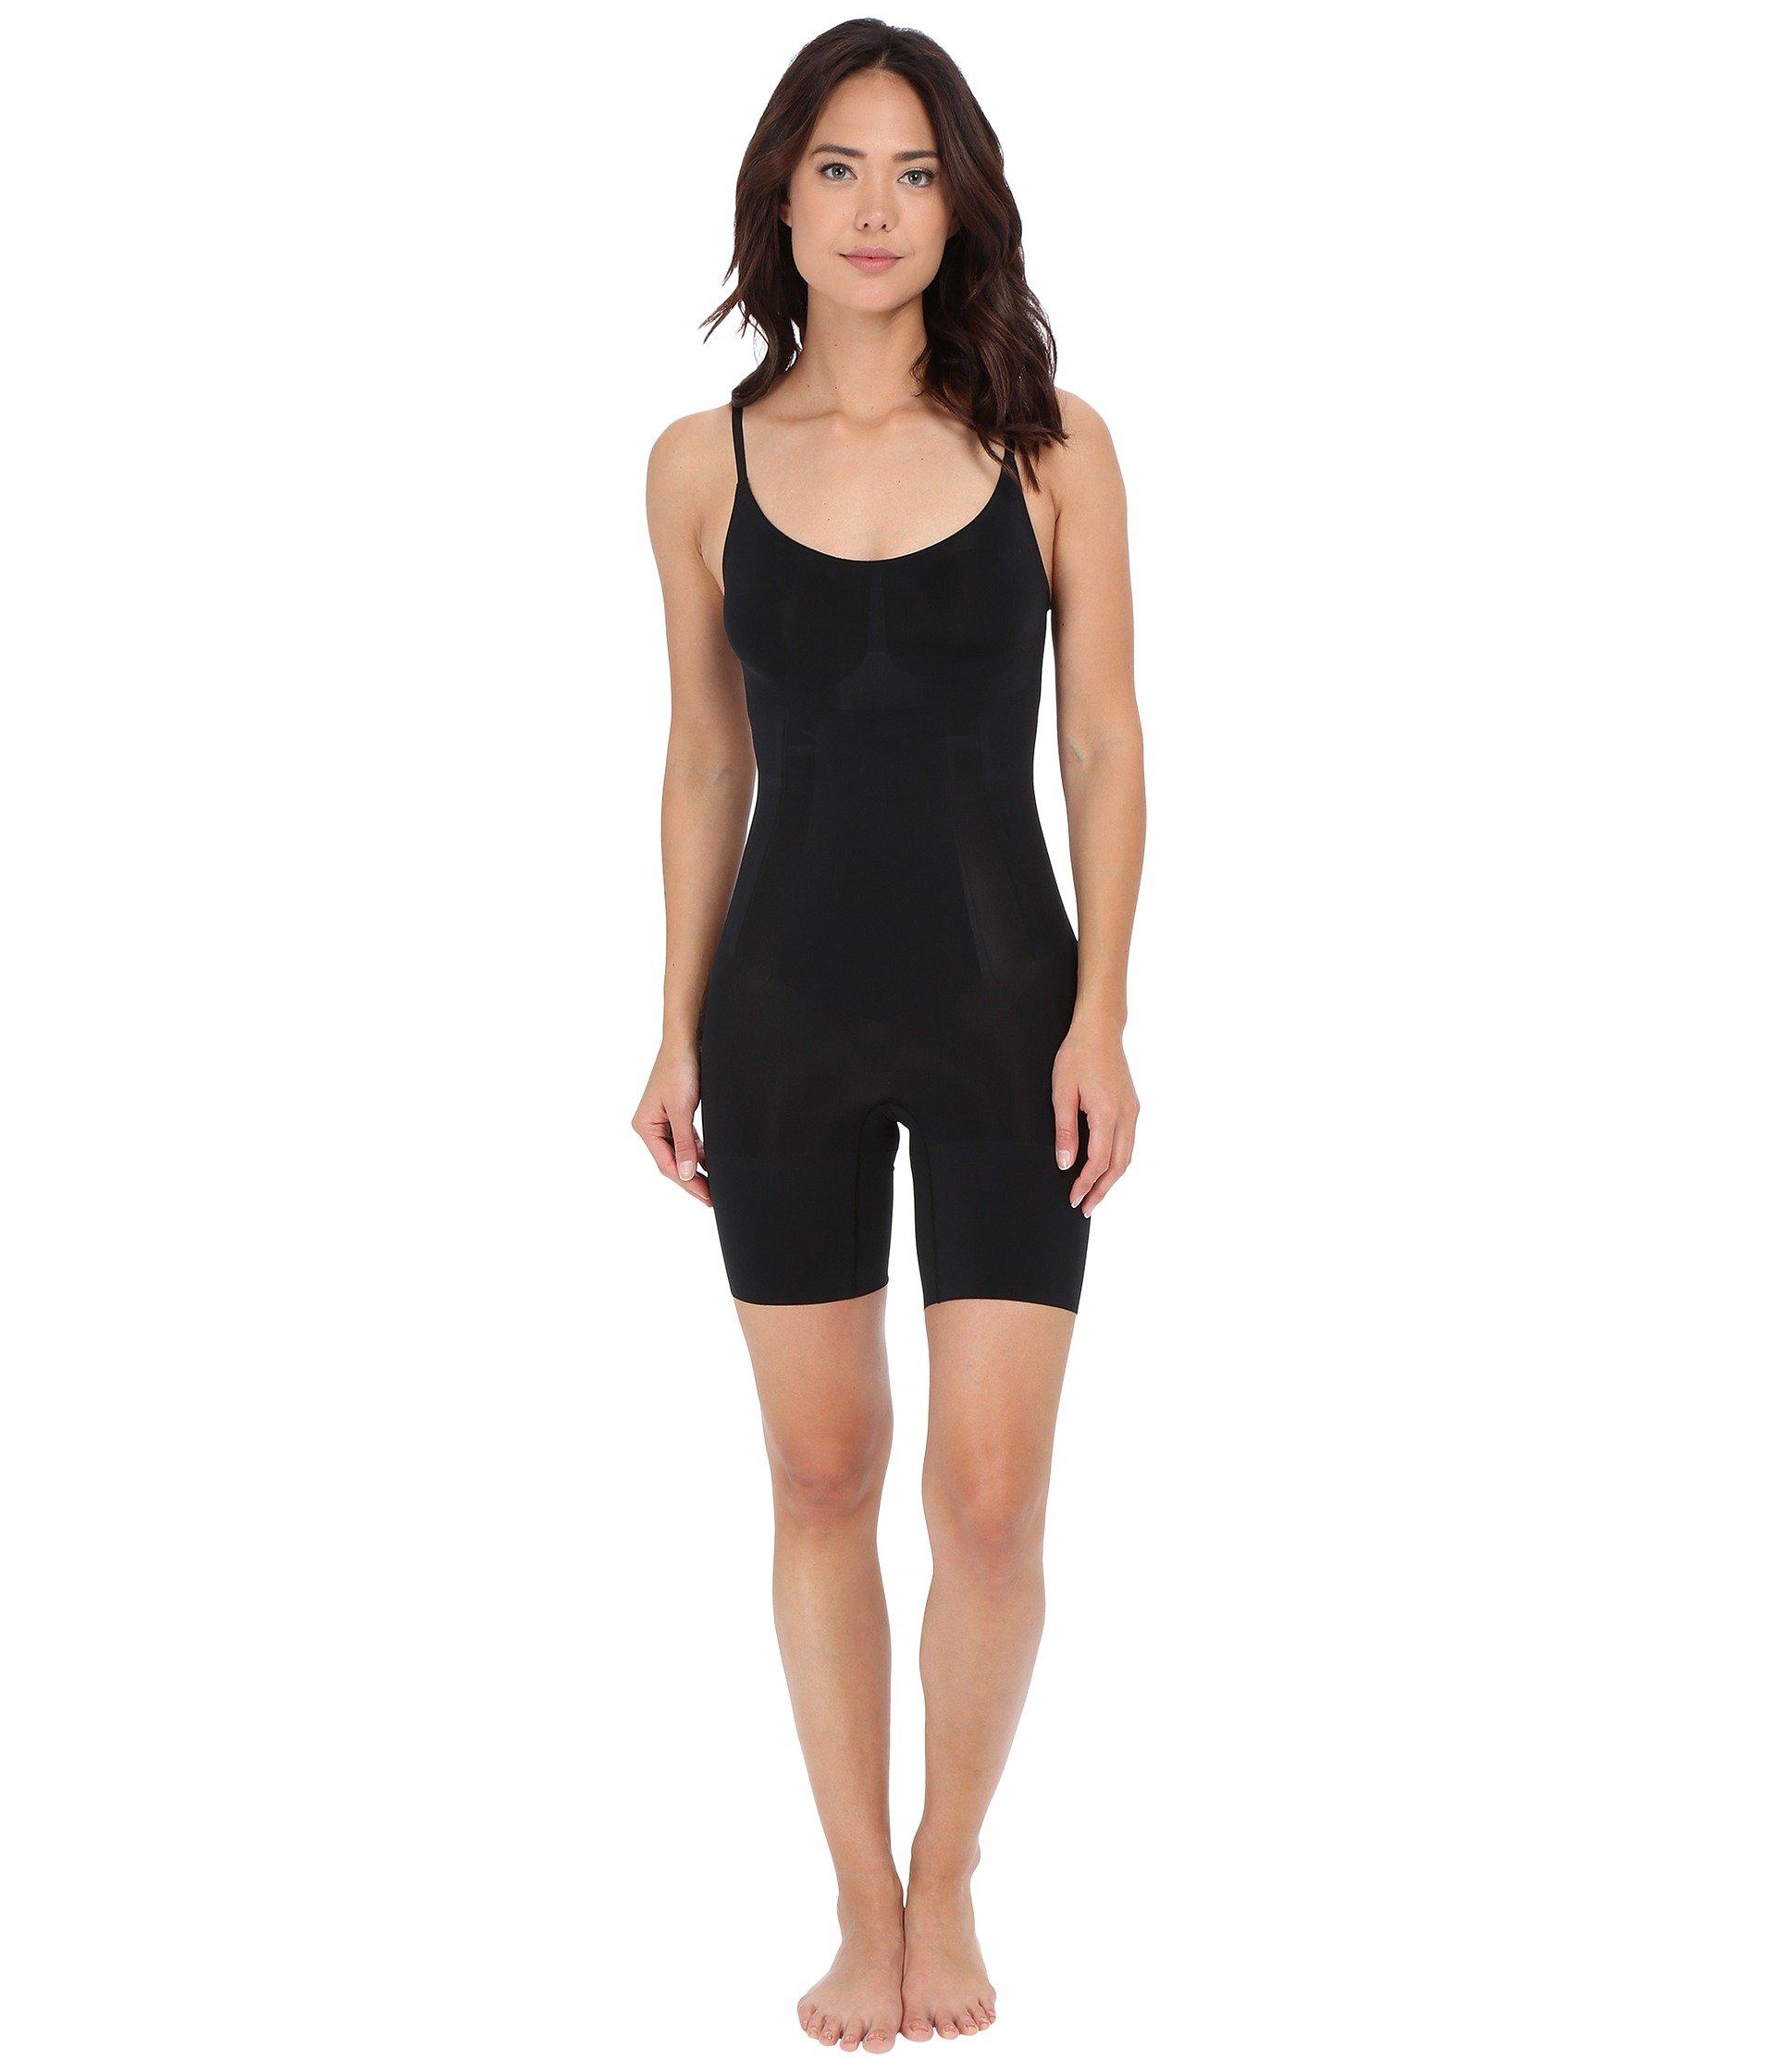 Black Bodysuit Spanx Mid Oncore Very thigh HgX7S